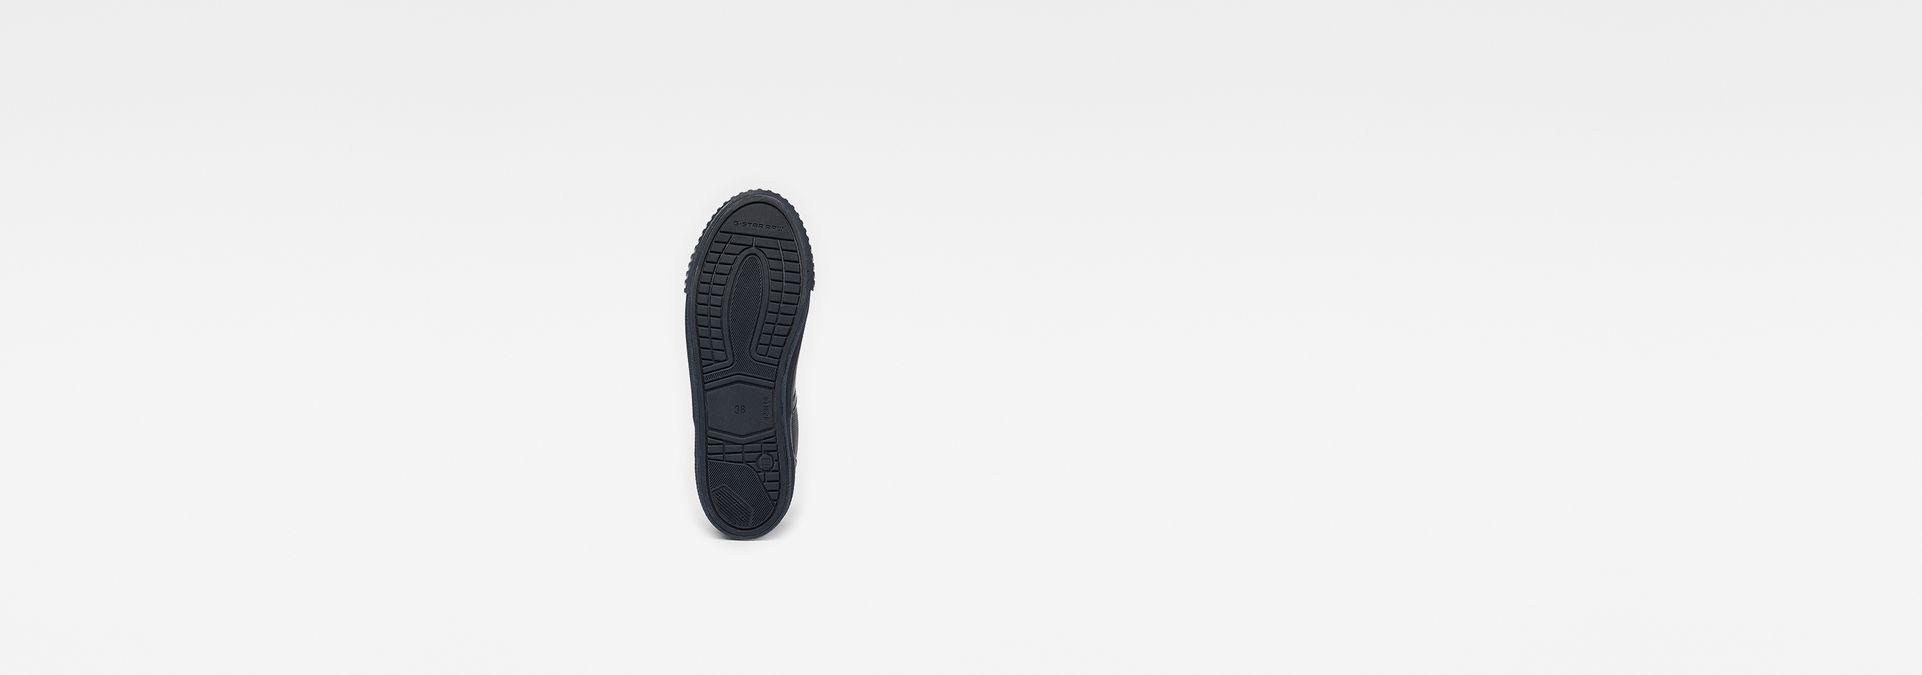 scuba sneakers dk navy women sale g star raw. Black Bedroom Furniture Sets. Home Design Ideas